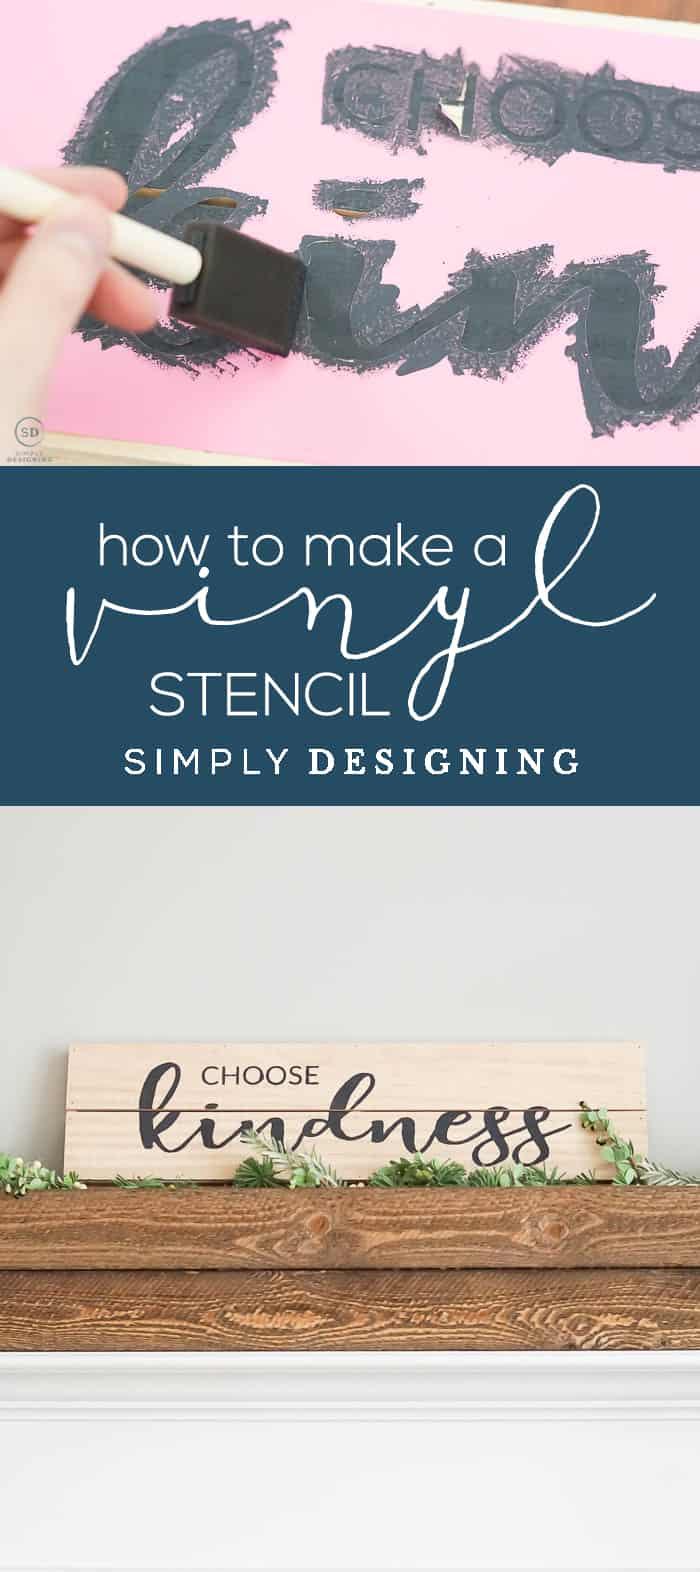 How to make a Vinyl Stencil